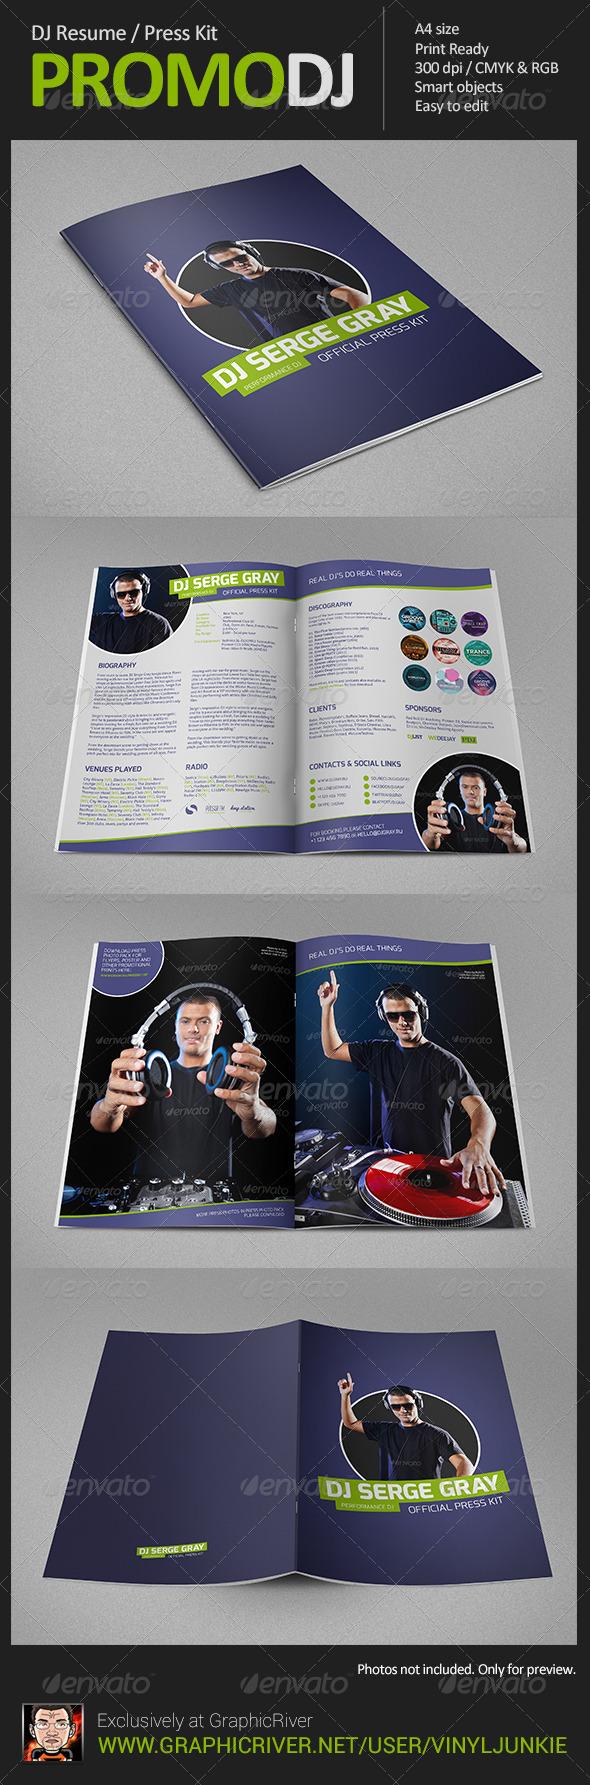 GraphicRiver PromoDJ DJ Resume Press Kit 6234500